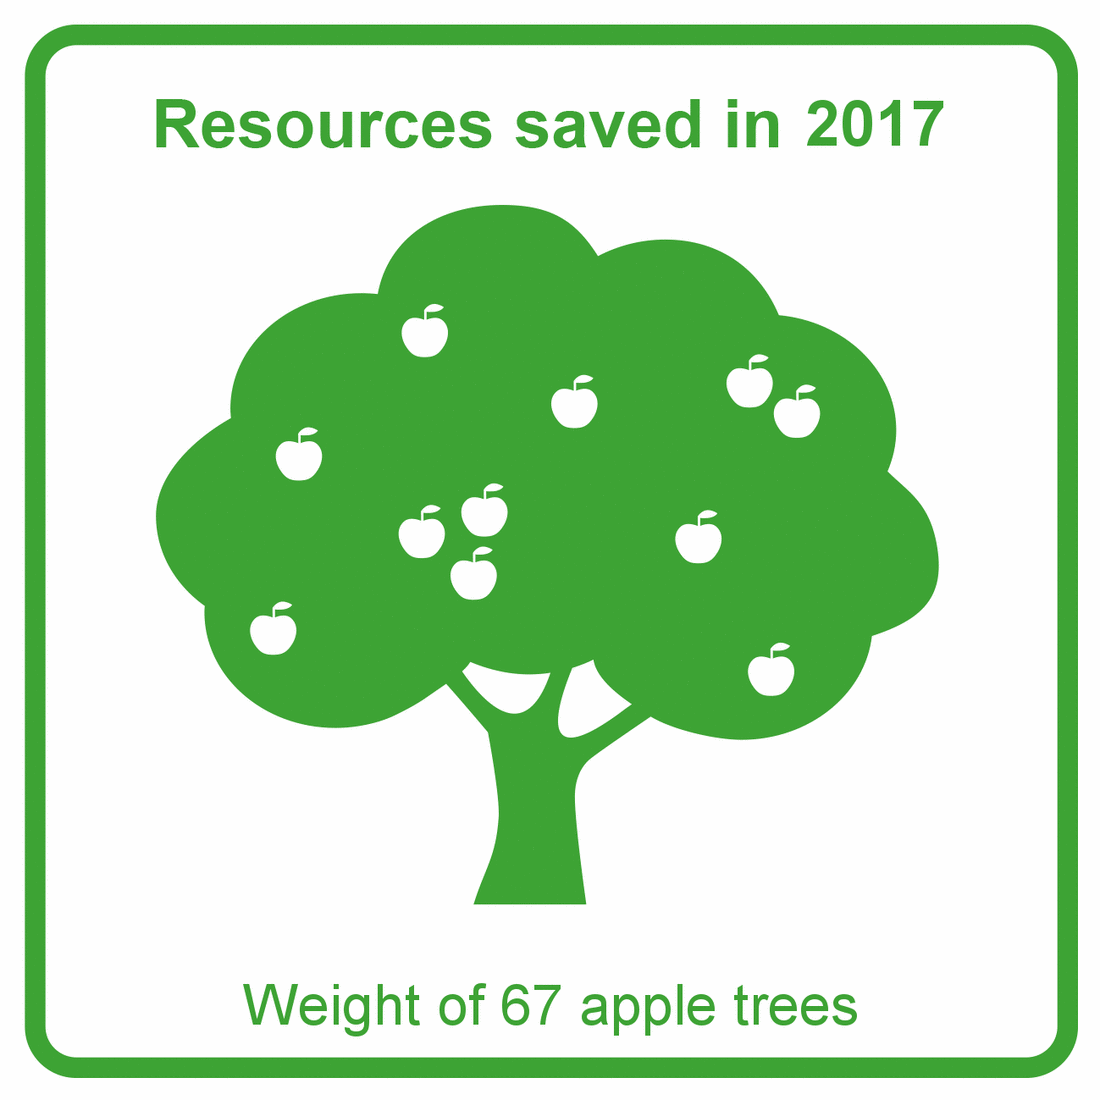 2017 - Apple trees graph